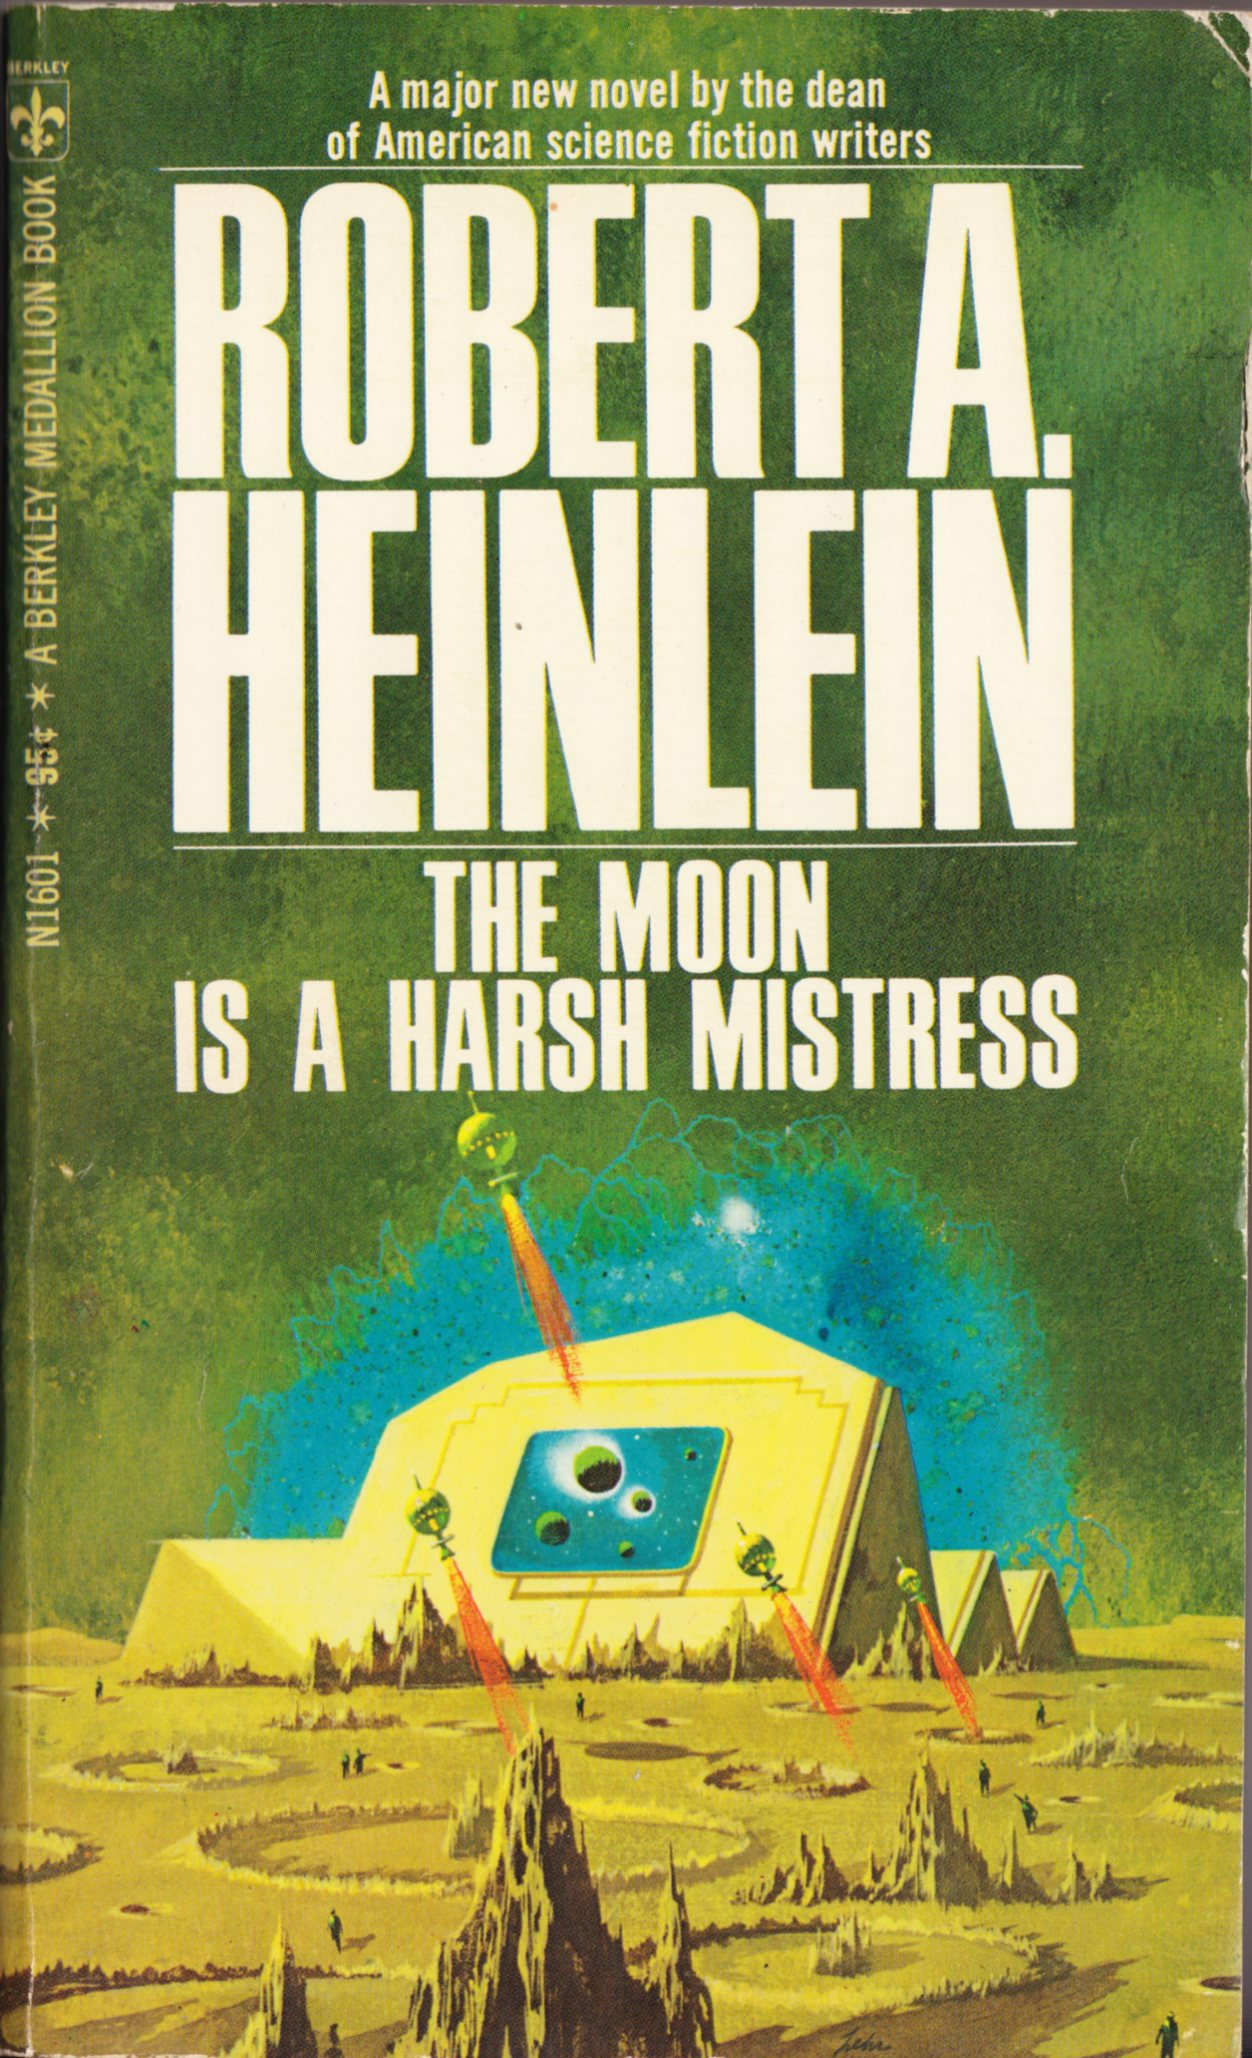 paul-lehr_the-moon-is-a-harsh-mistress-ny-berkley-19681.jpg